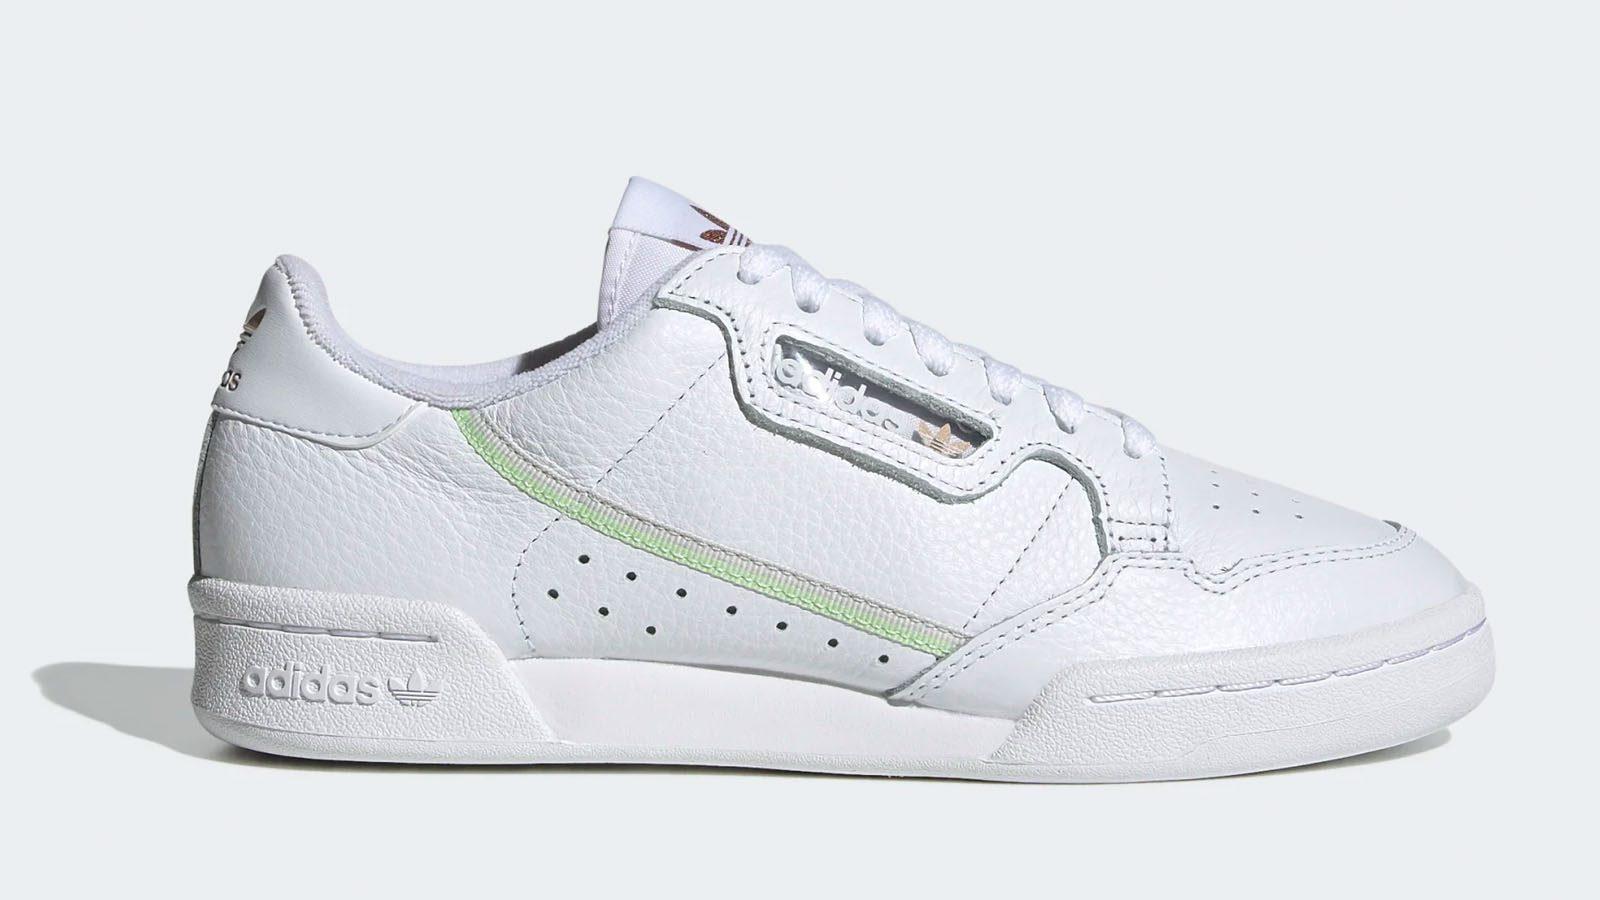 adidas listicle_0008_adidas continental 80 green